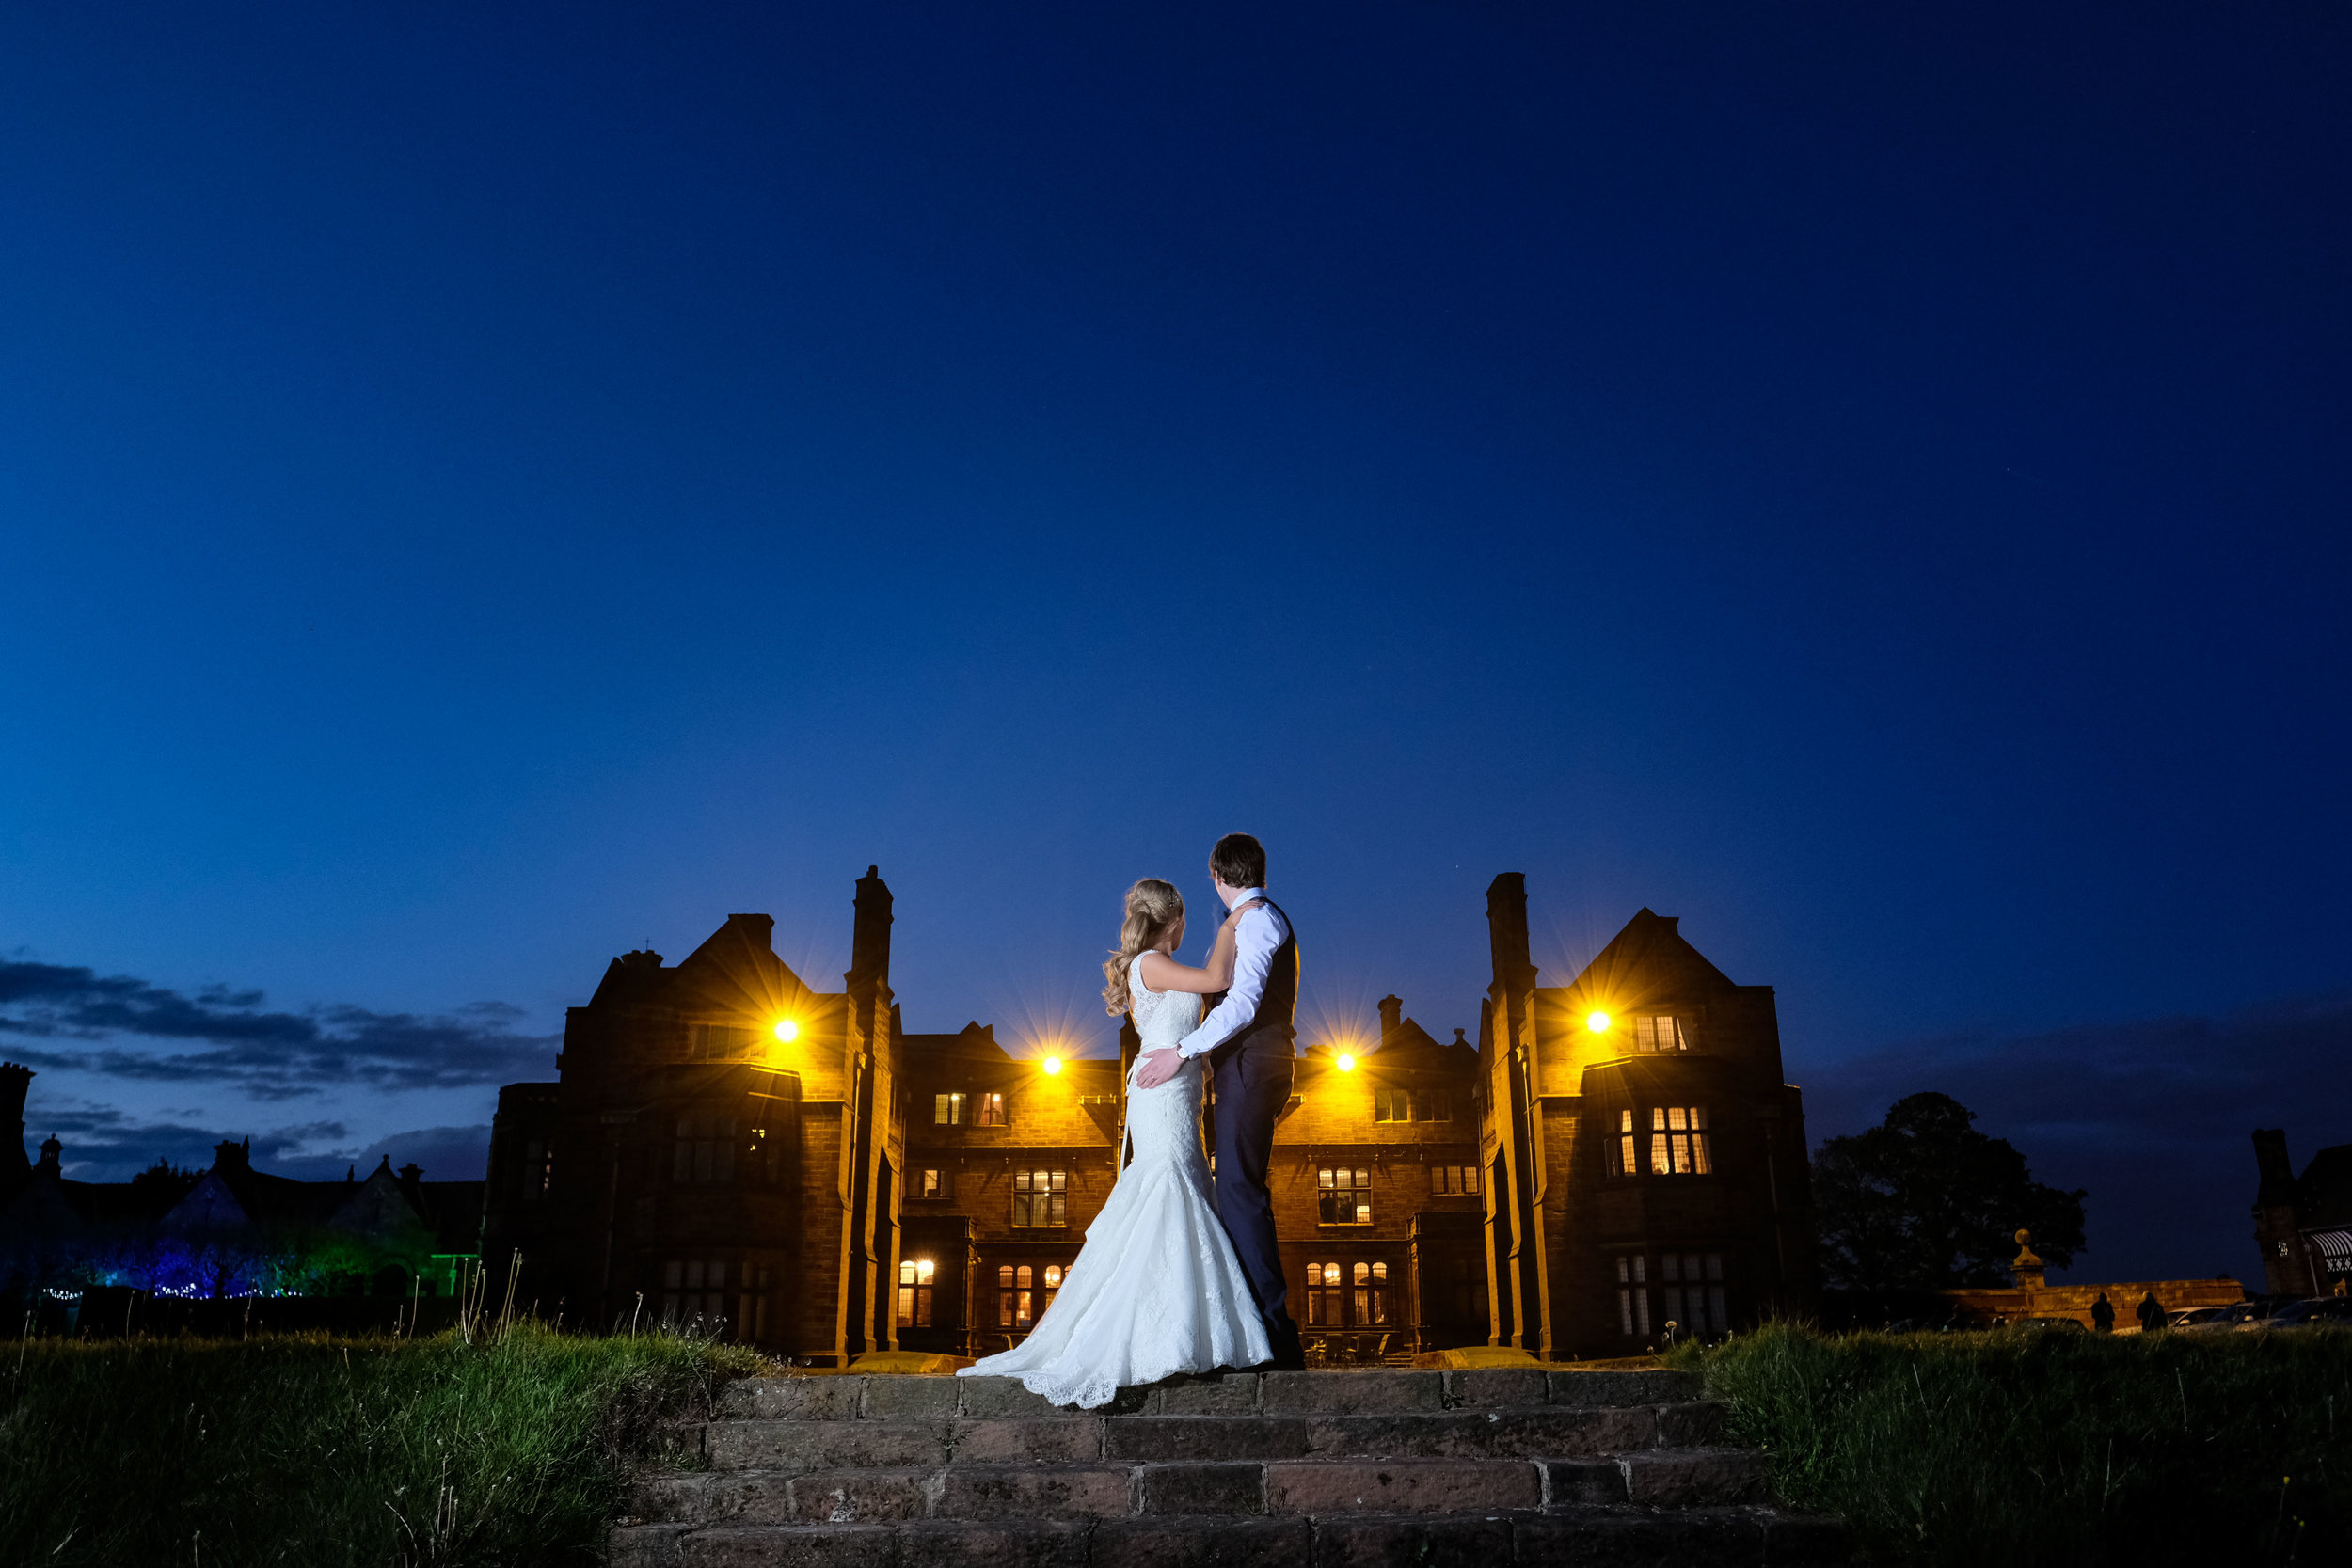 Thornton manor wedding photography cheshire wedding photographer liverpool manchester warrington chester wirral wedding BLOG (108 of 108).jpg